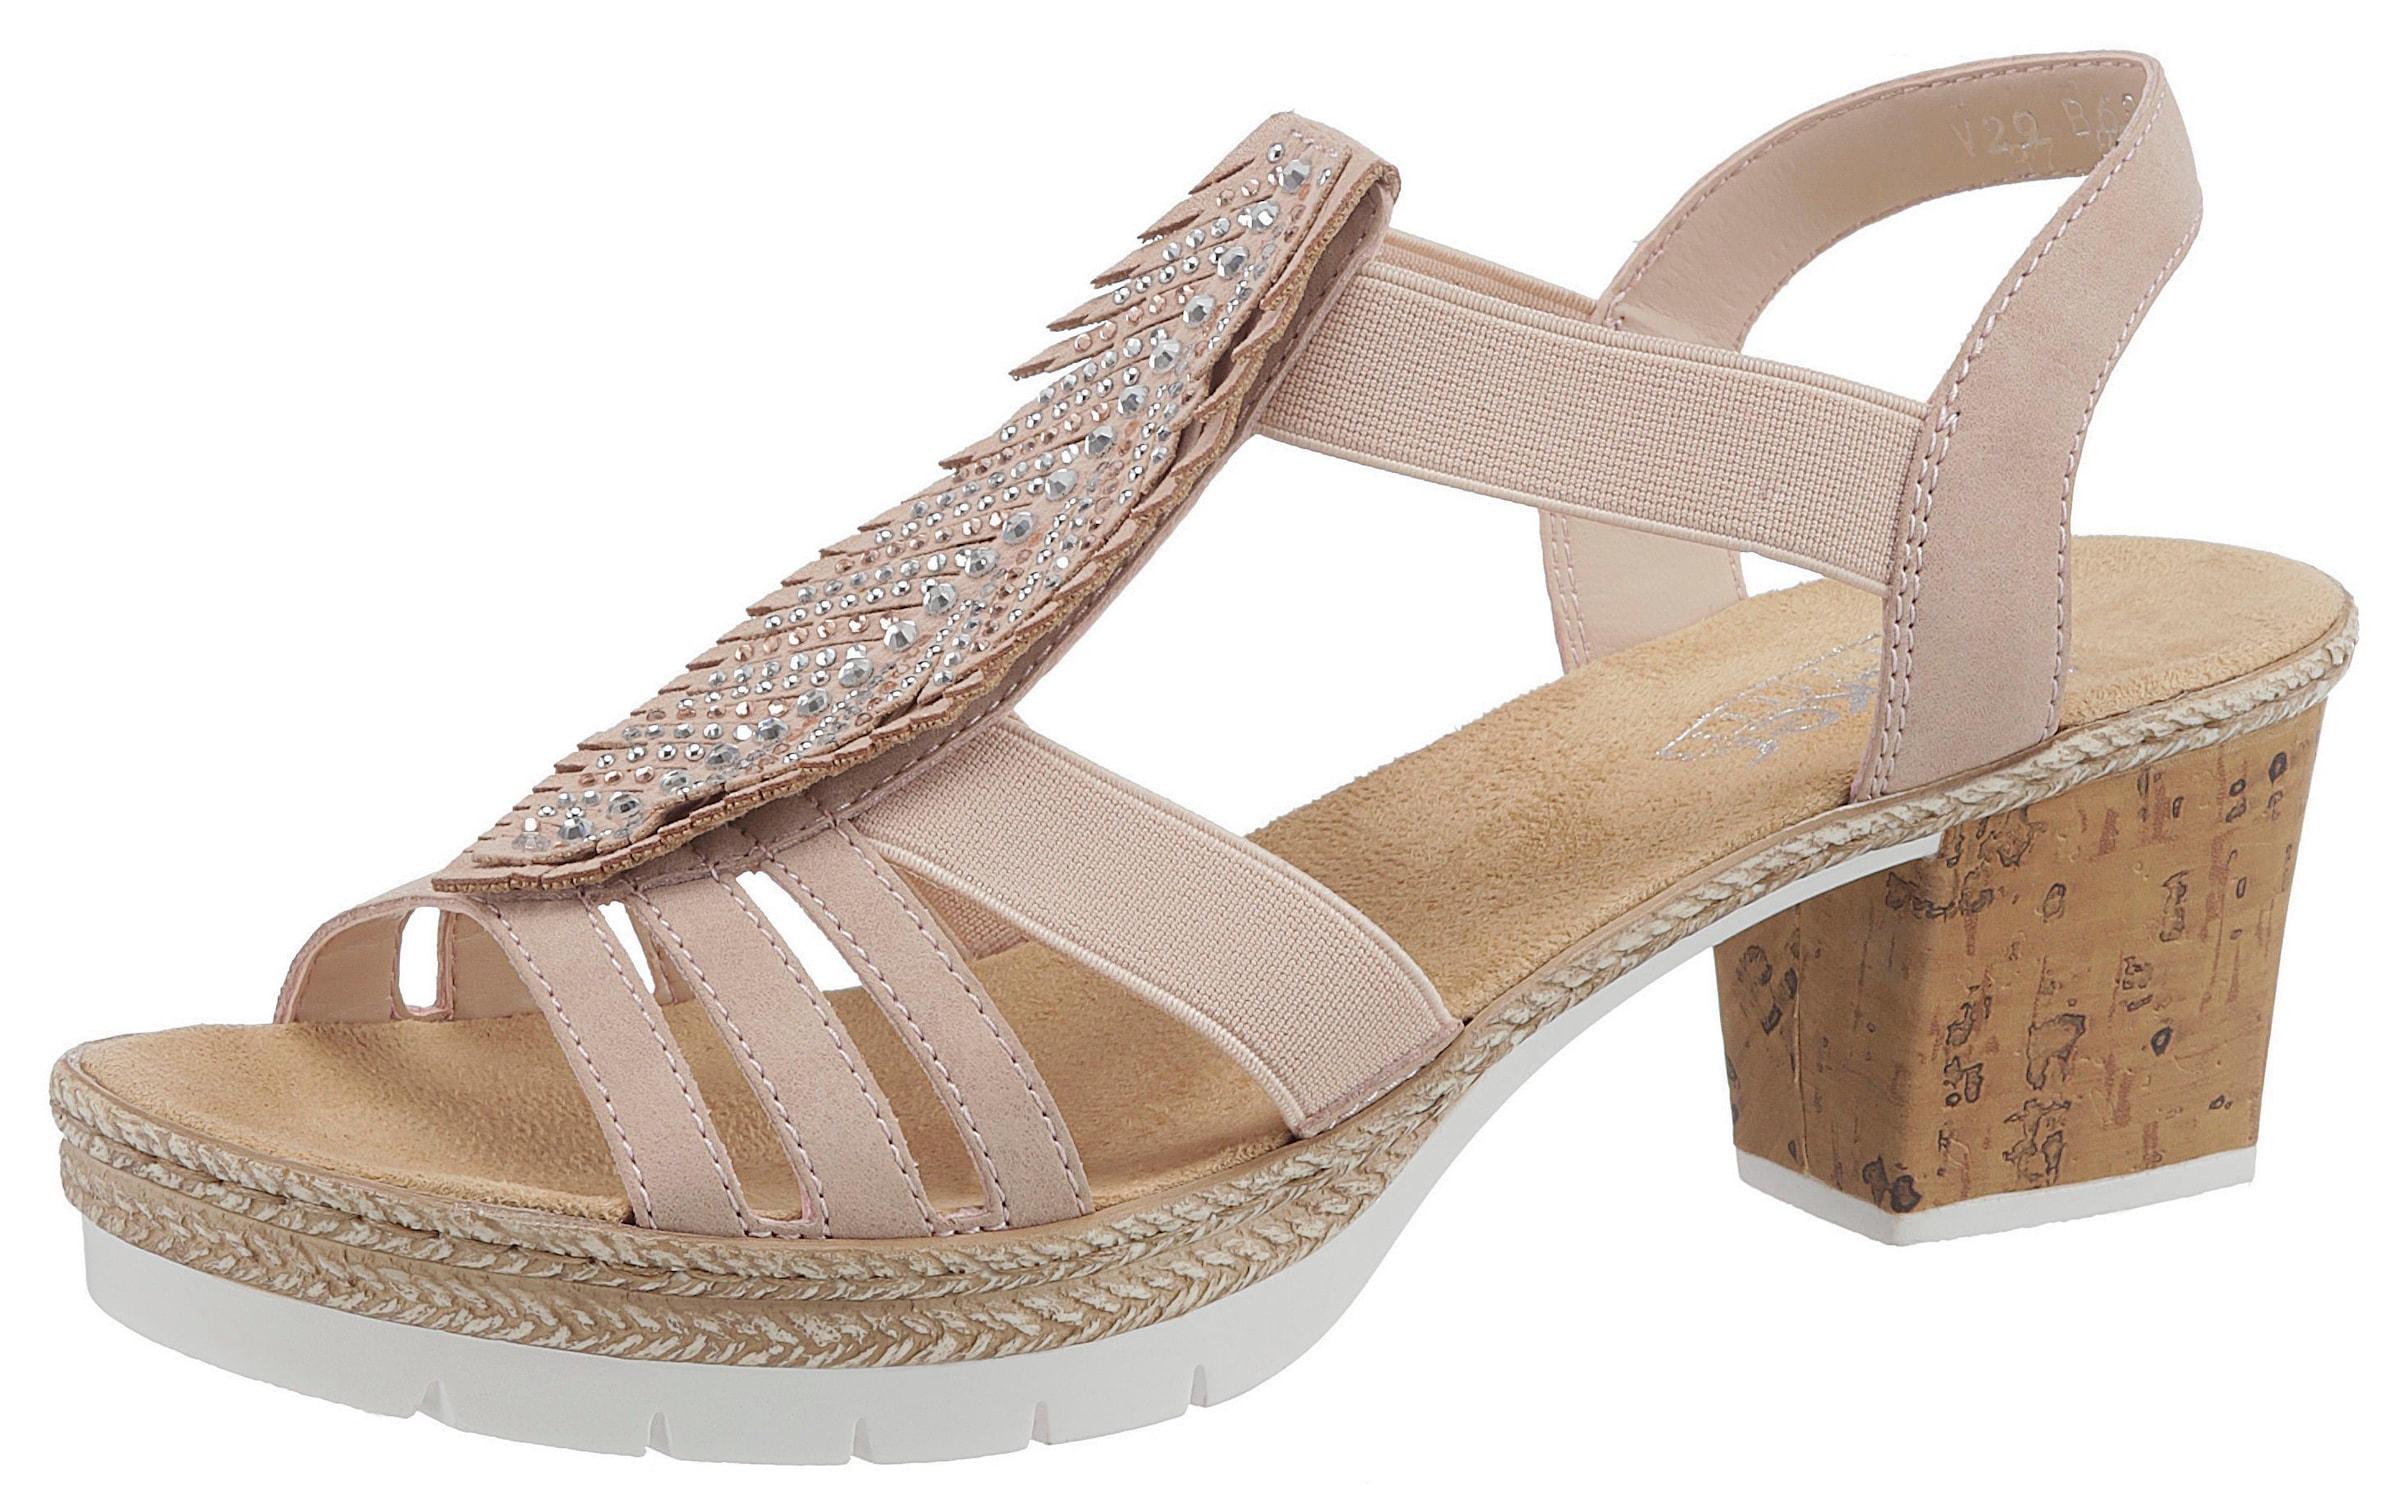 Zu Sandalette Sandalen Elegante Rieker Damen Details Damenmode Sandaletten 3qA54RjL